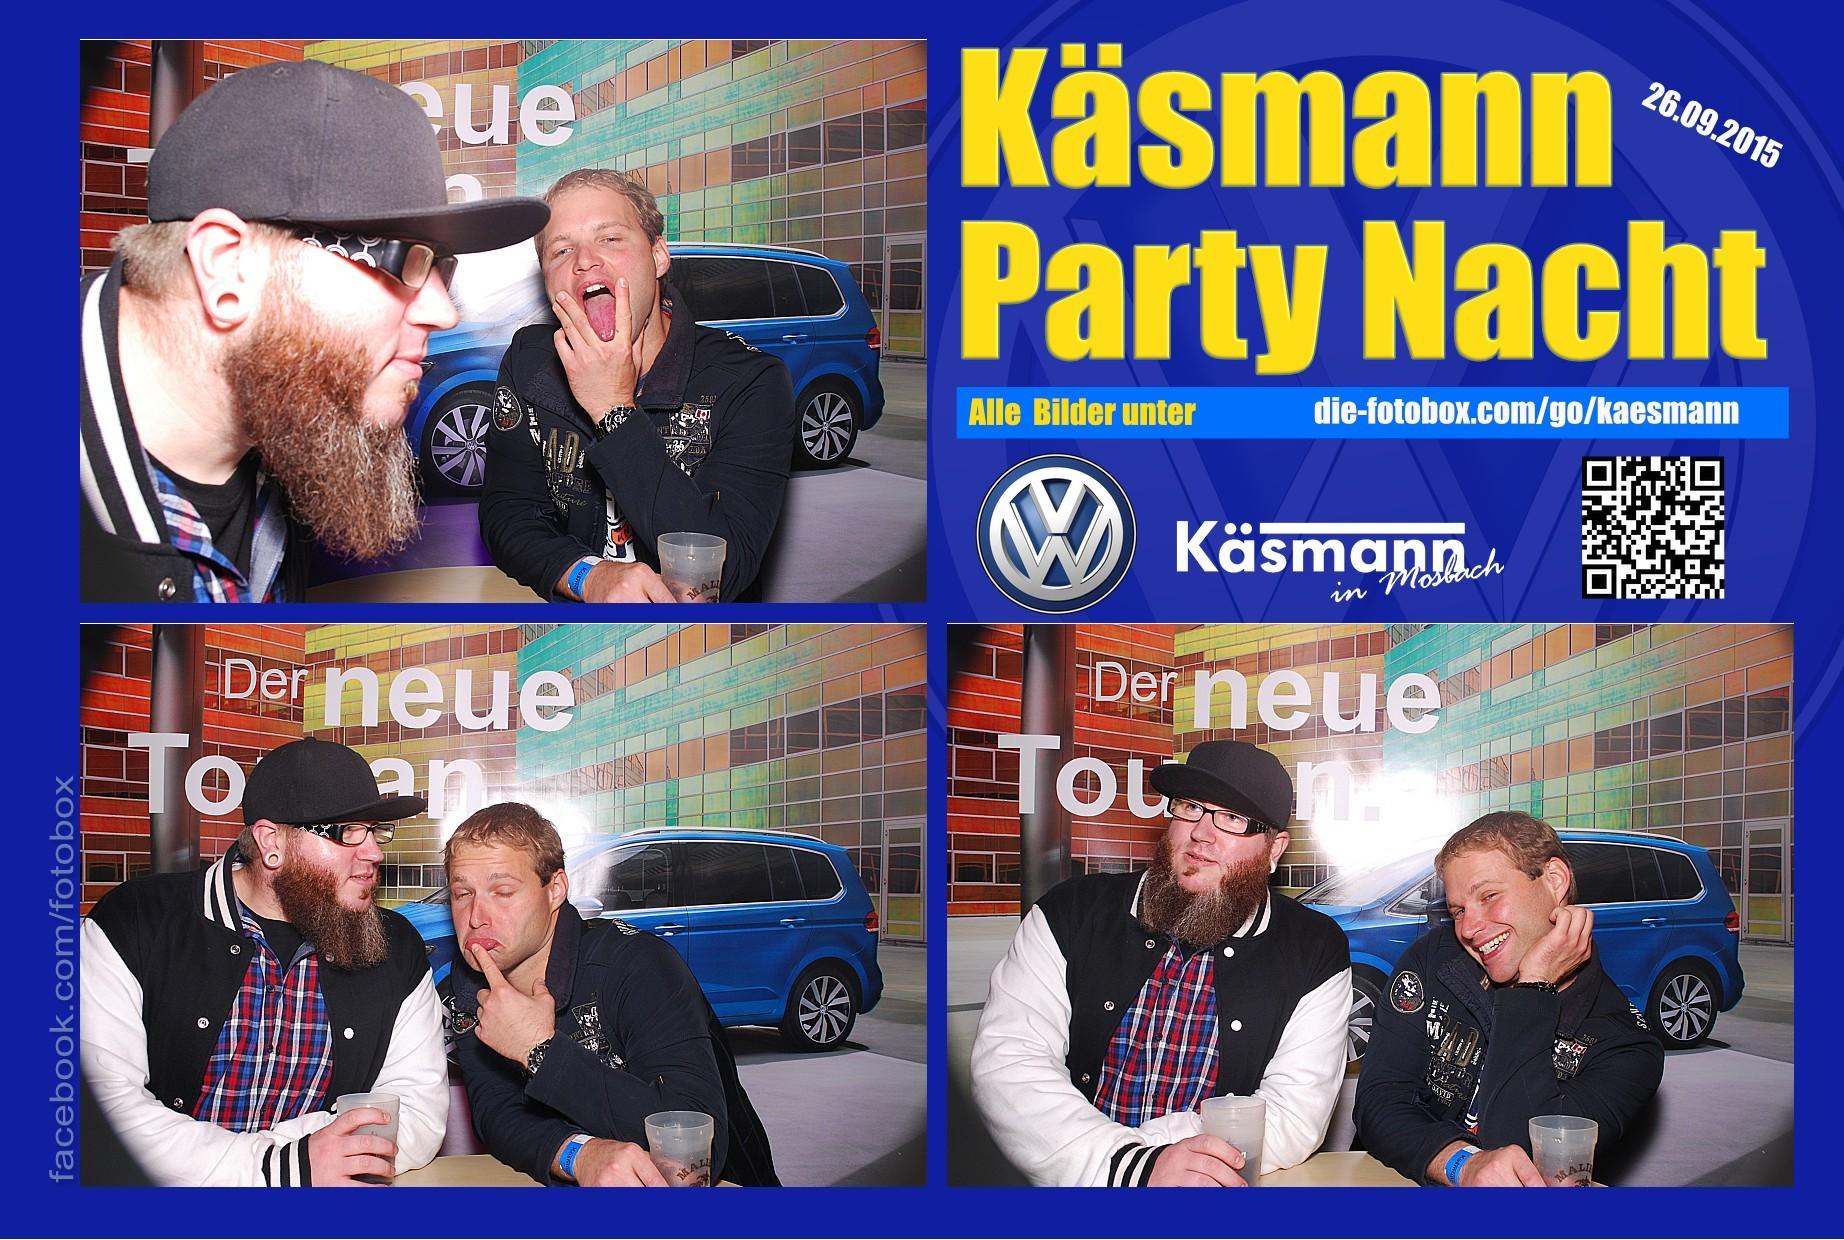 Käsmannparty 2015 - www.die-fotobox.com 01220